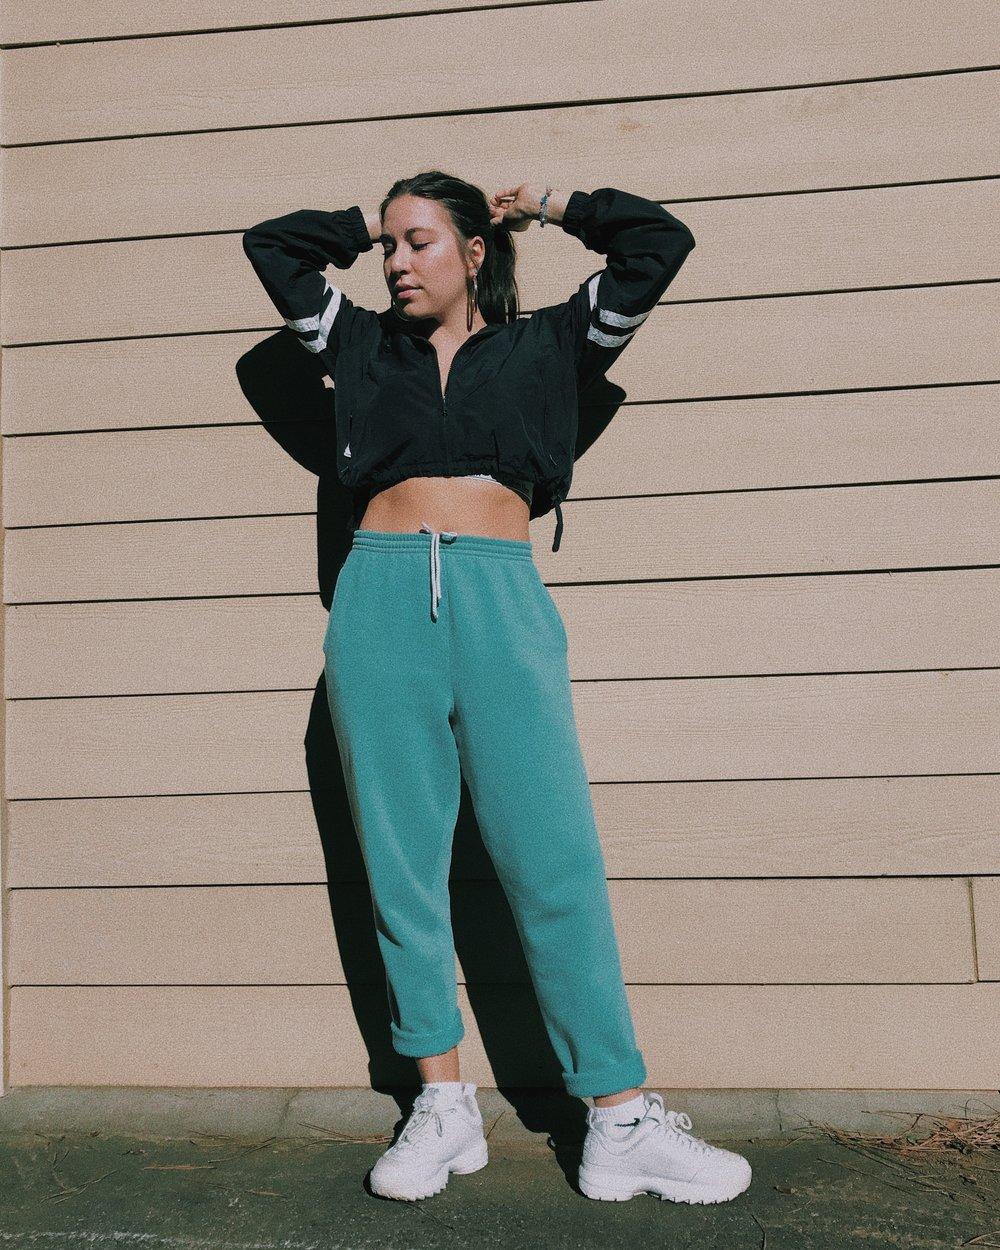 Valheria (@valheria123) in vintage sweats.